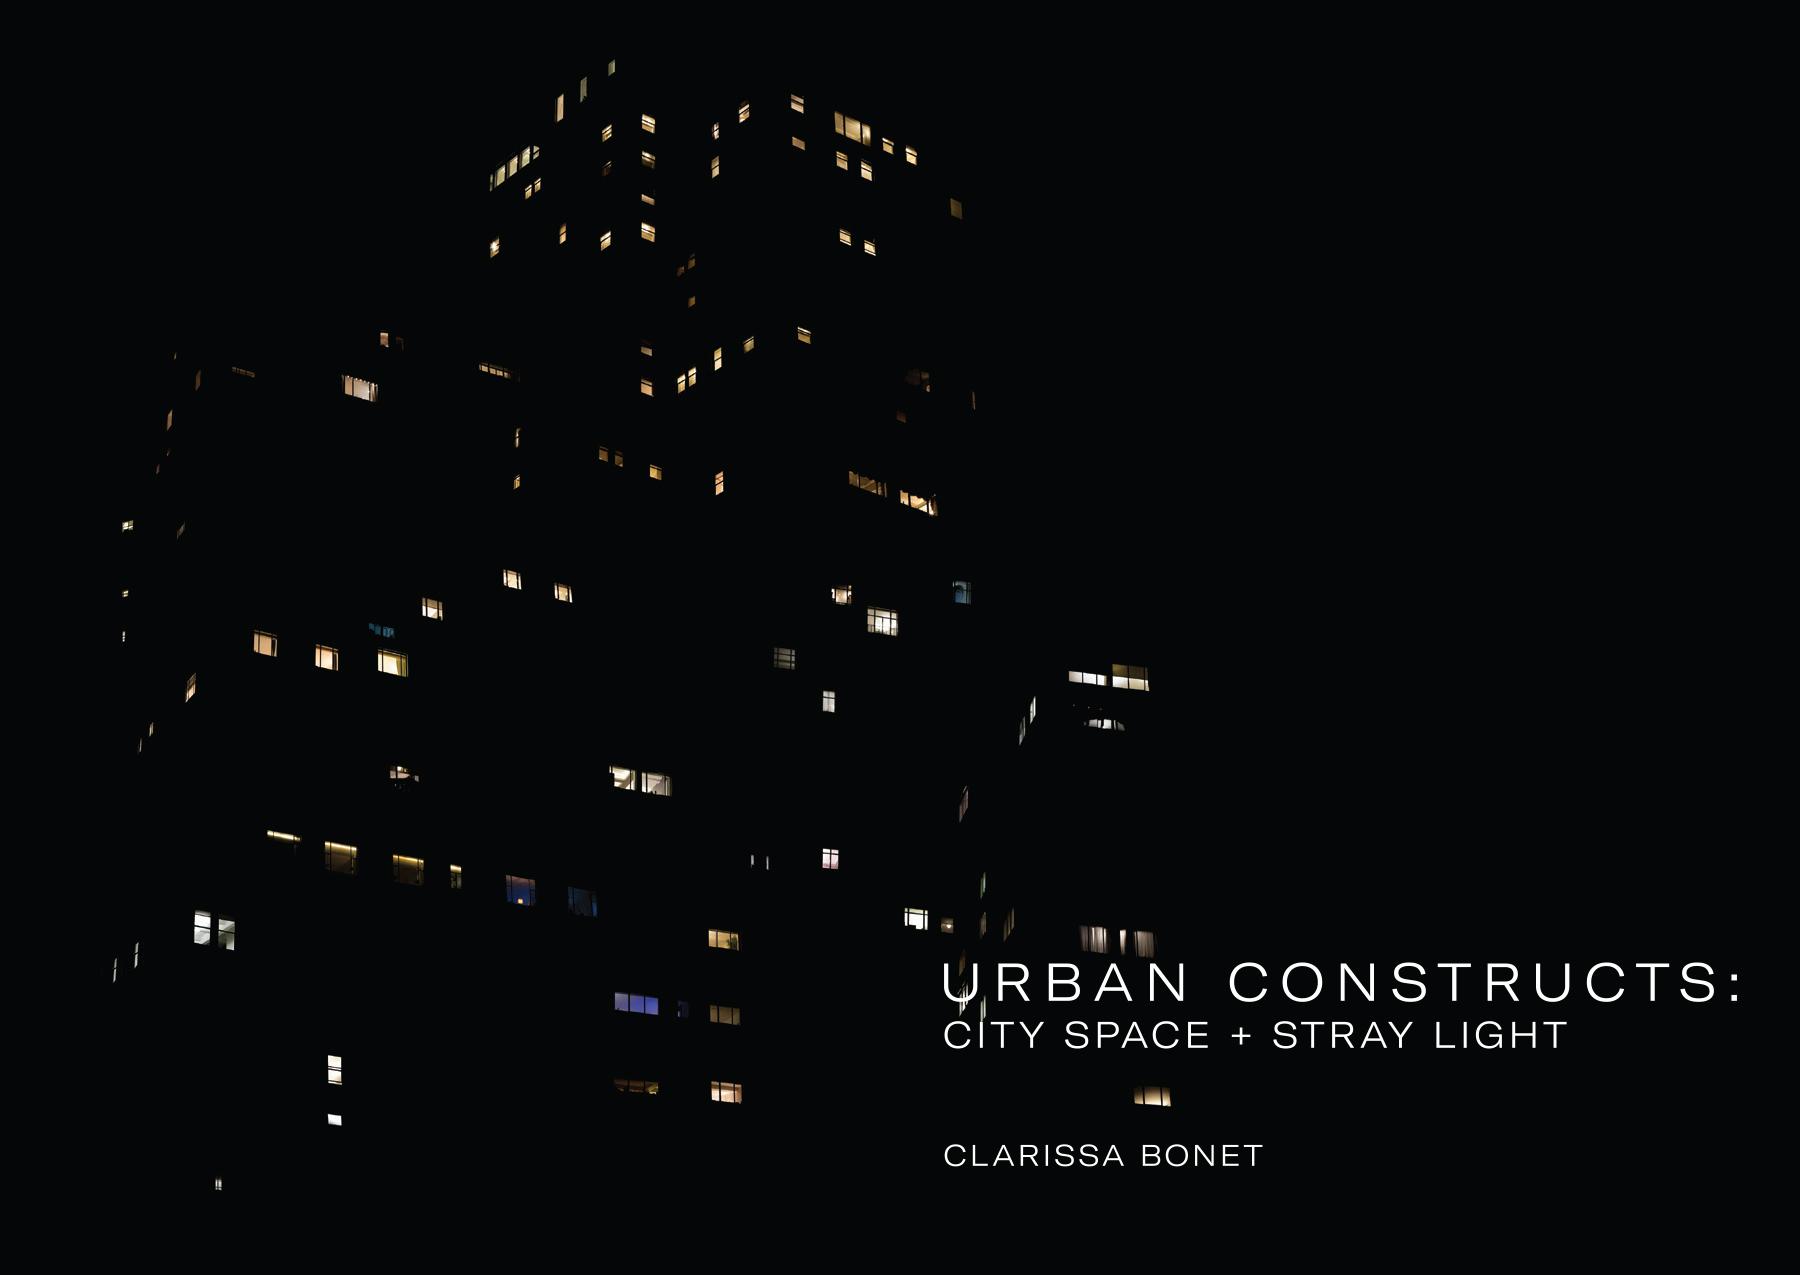 CB_Urban_Constructs_Stray_Light_Postcard_Final(2)-1.jpg